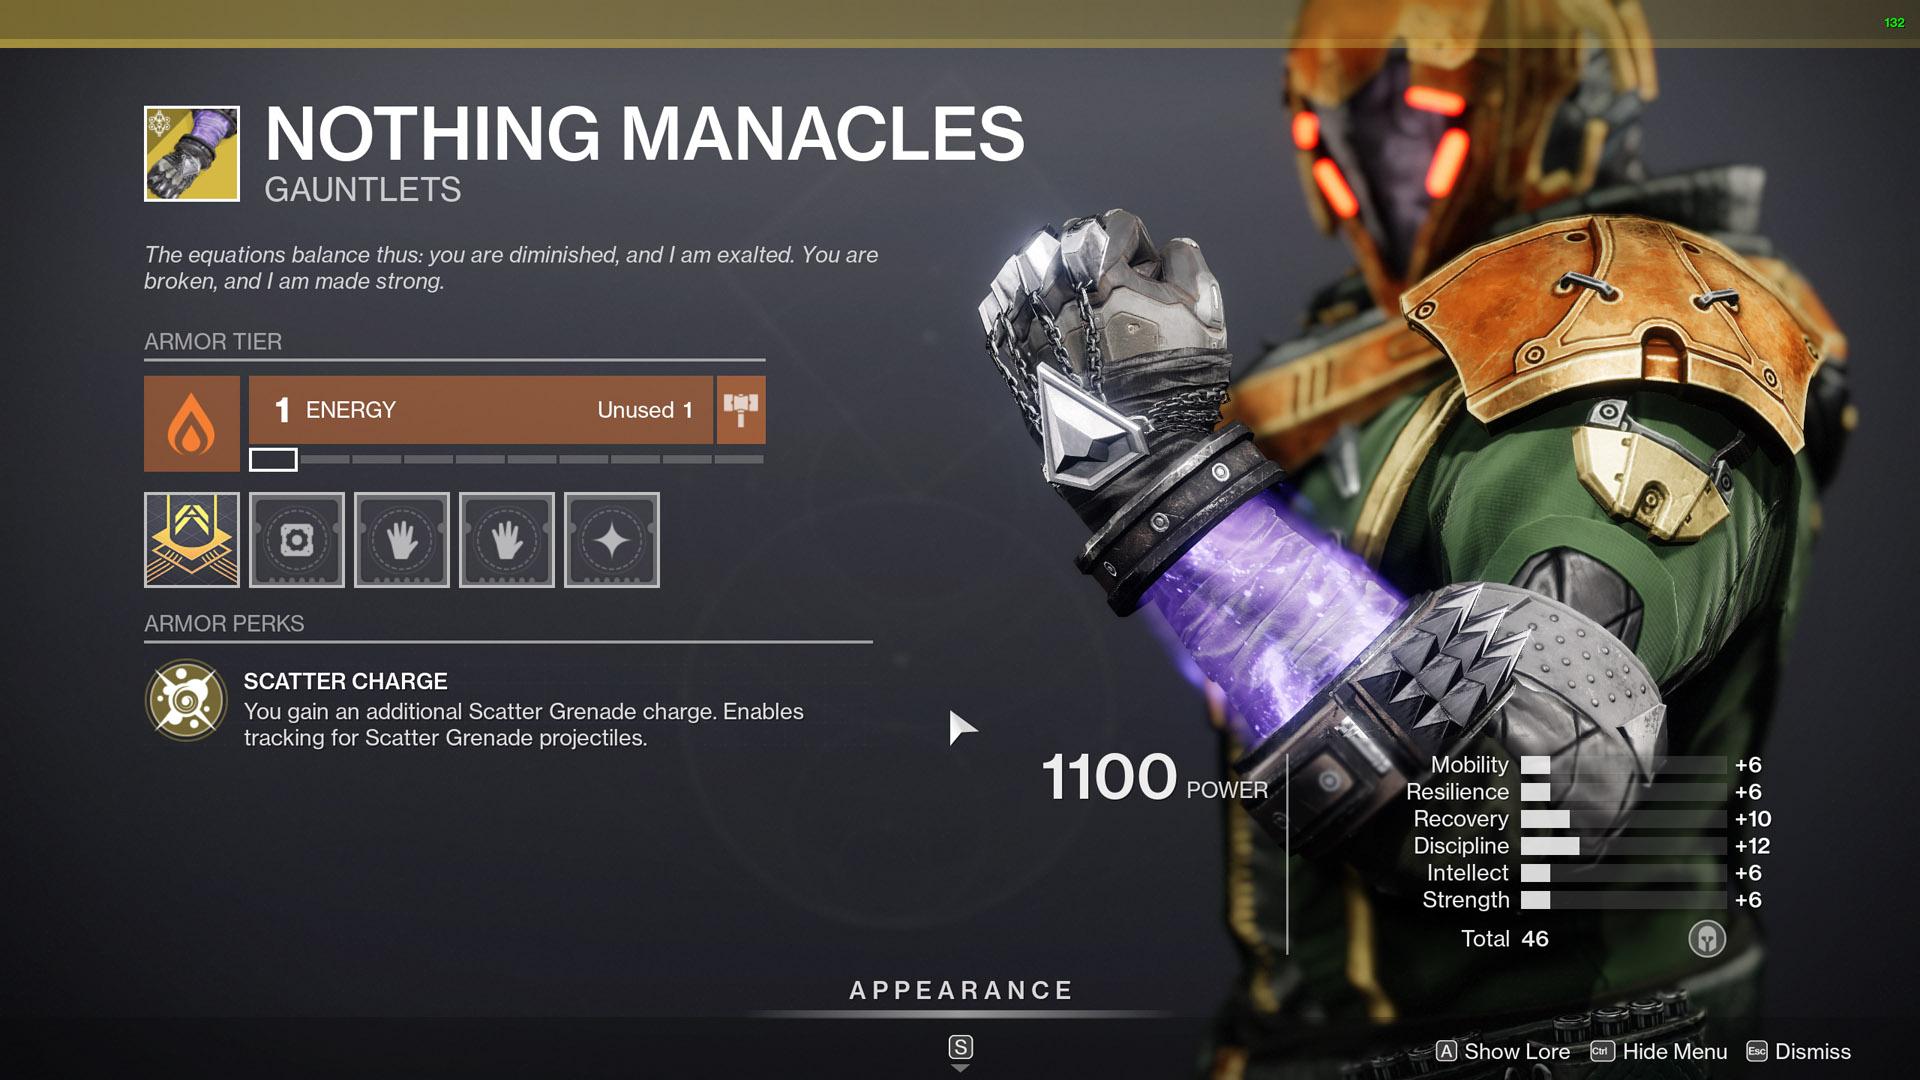 destiny 2 exotic warlock armor nothing manacles